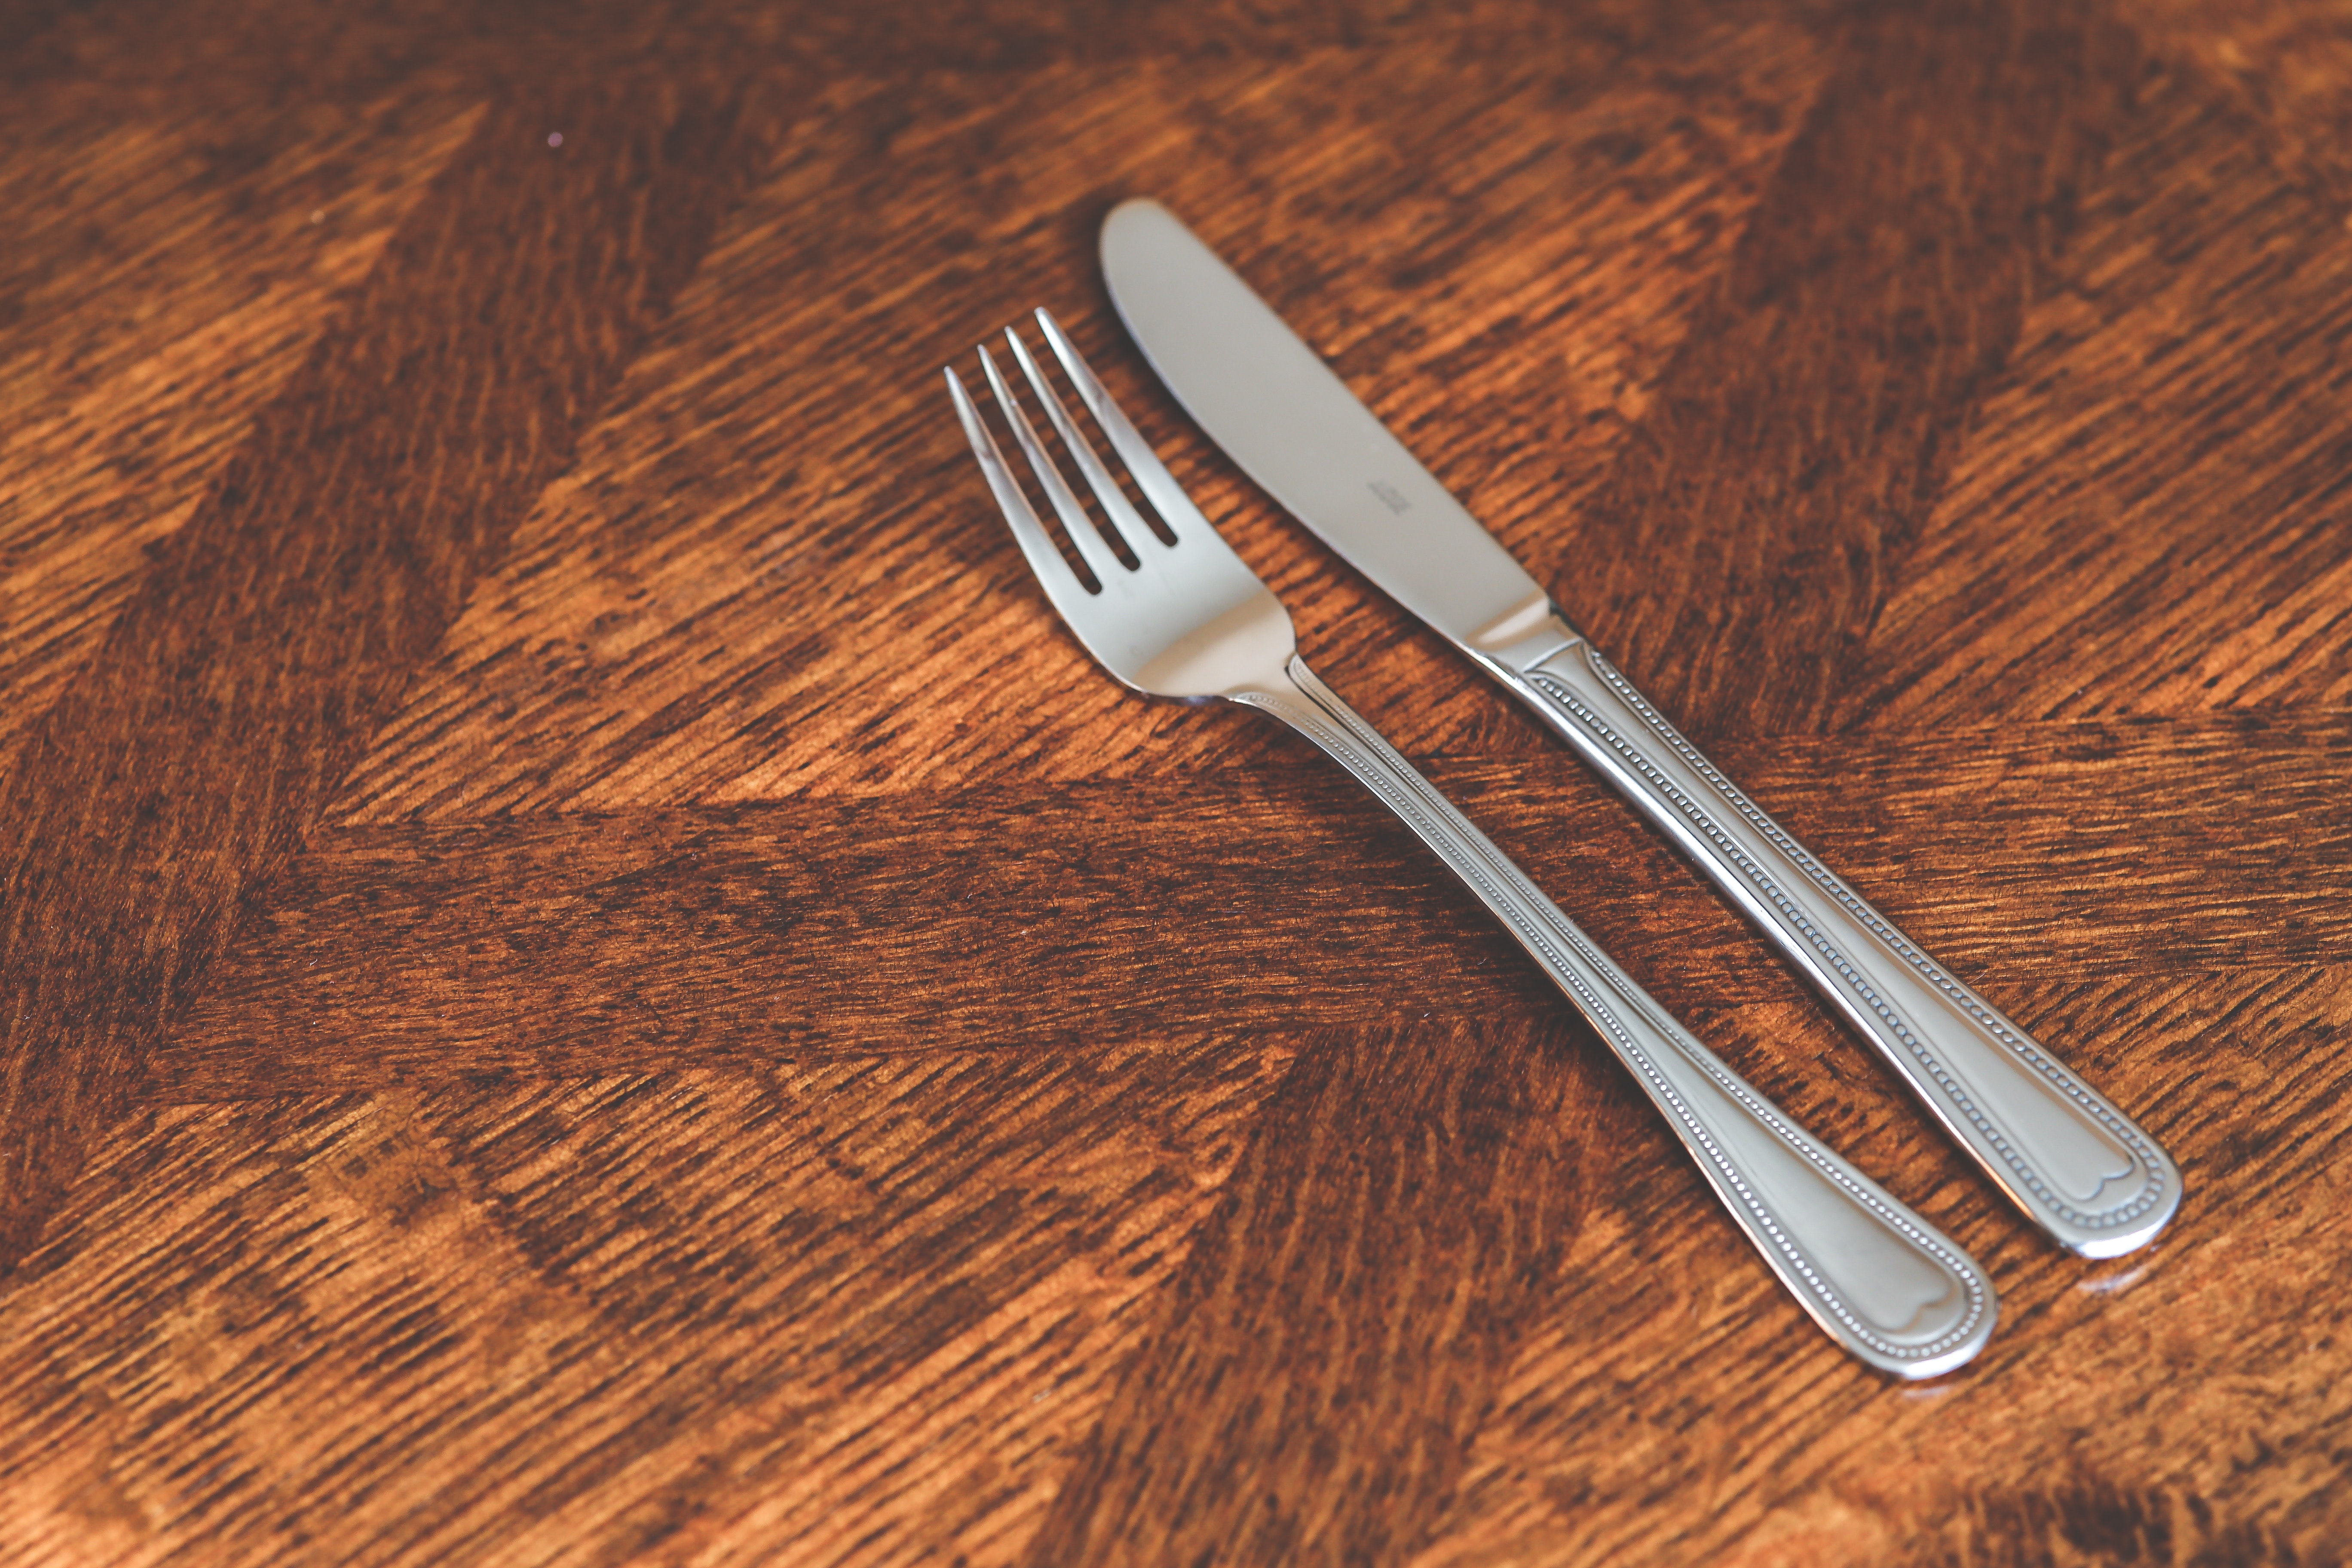 Silver kinve & fork photo